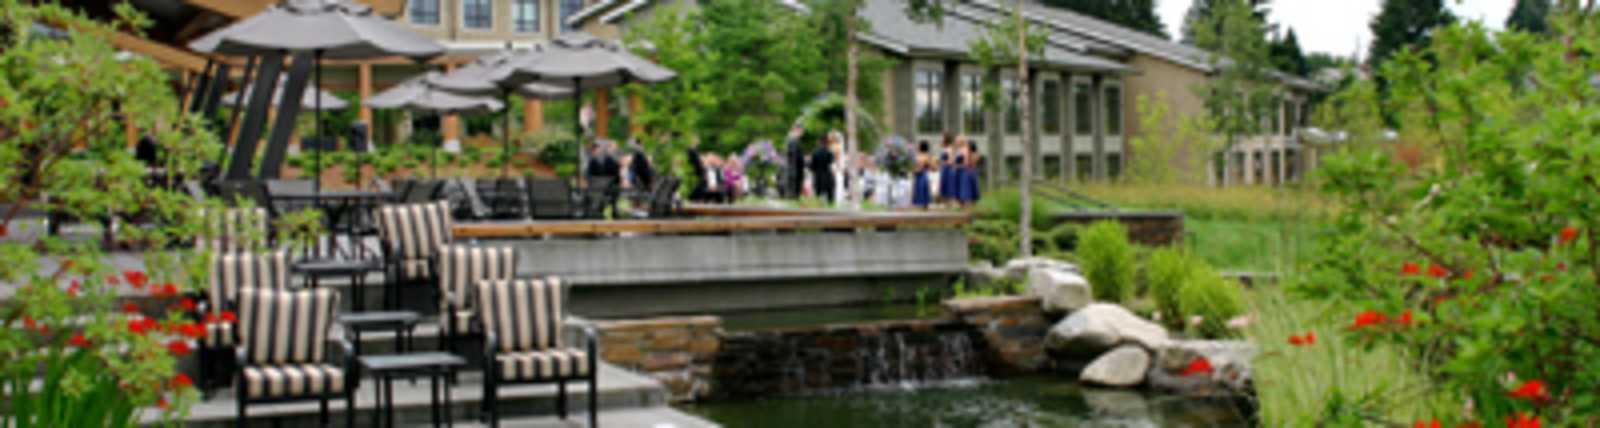 meeting-facility-Cedarbrook_Lodge_Meeting_Facility-2.jpg